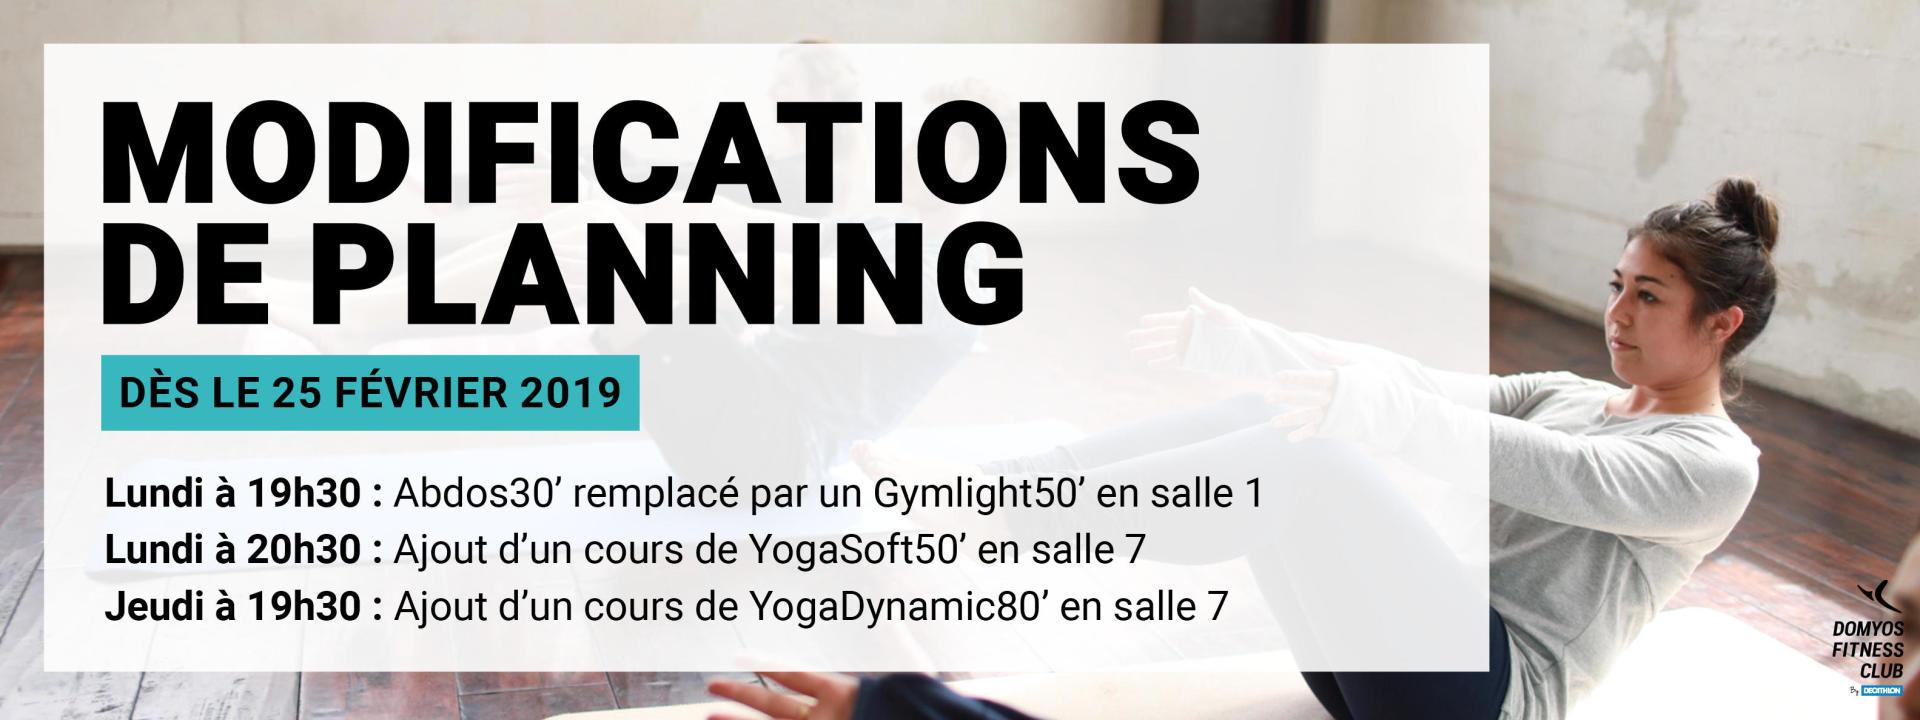 Modif Planning Lille 2019